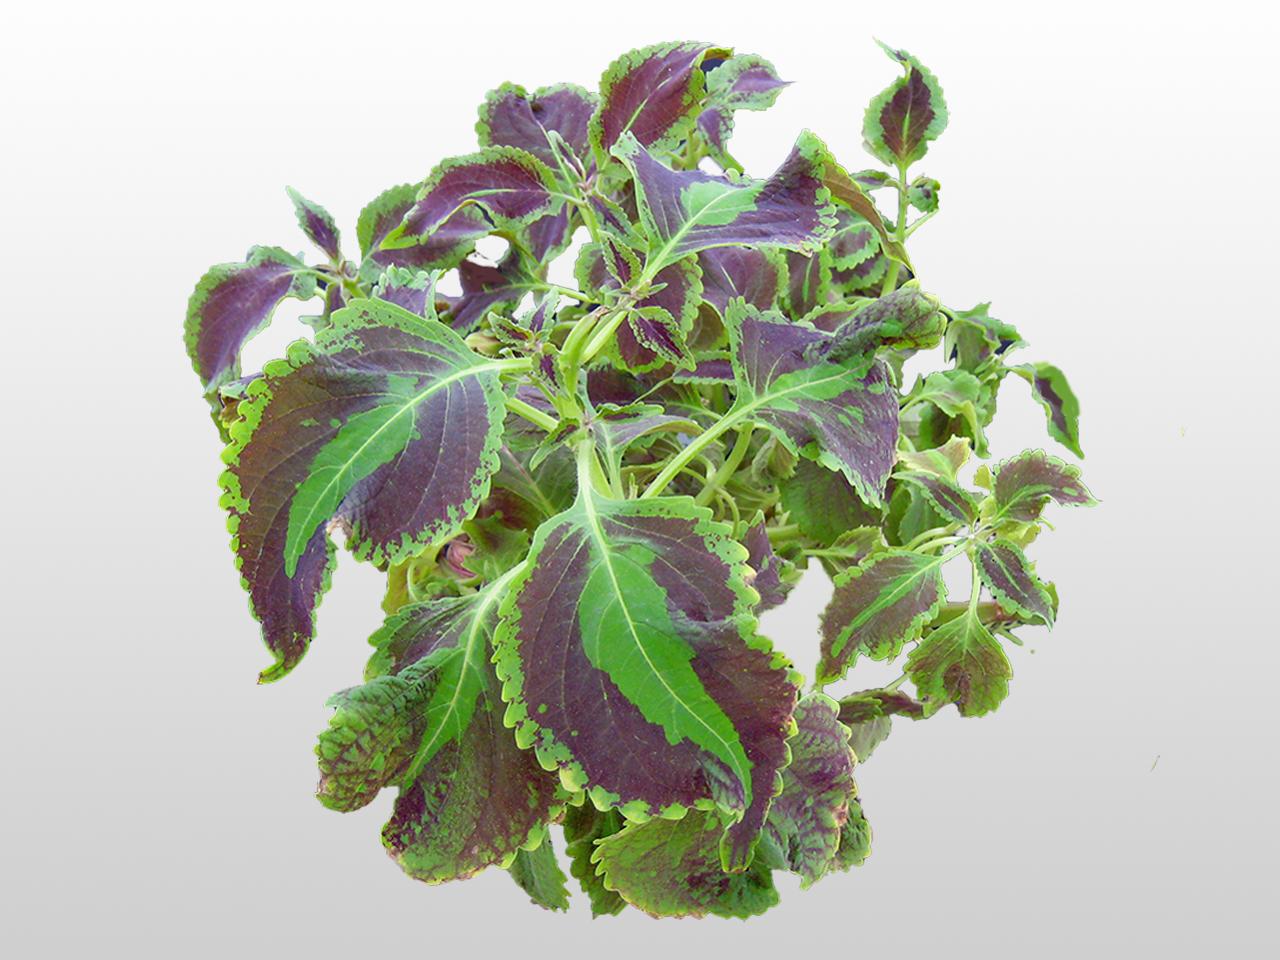 green and purple coleus plant